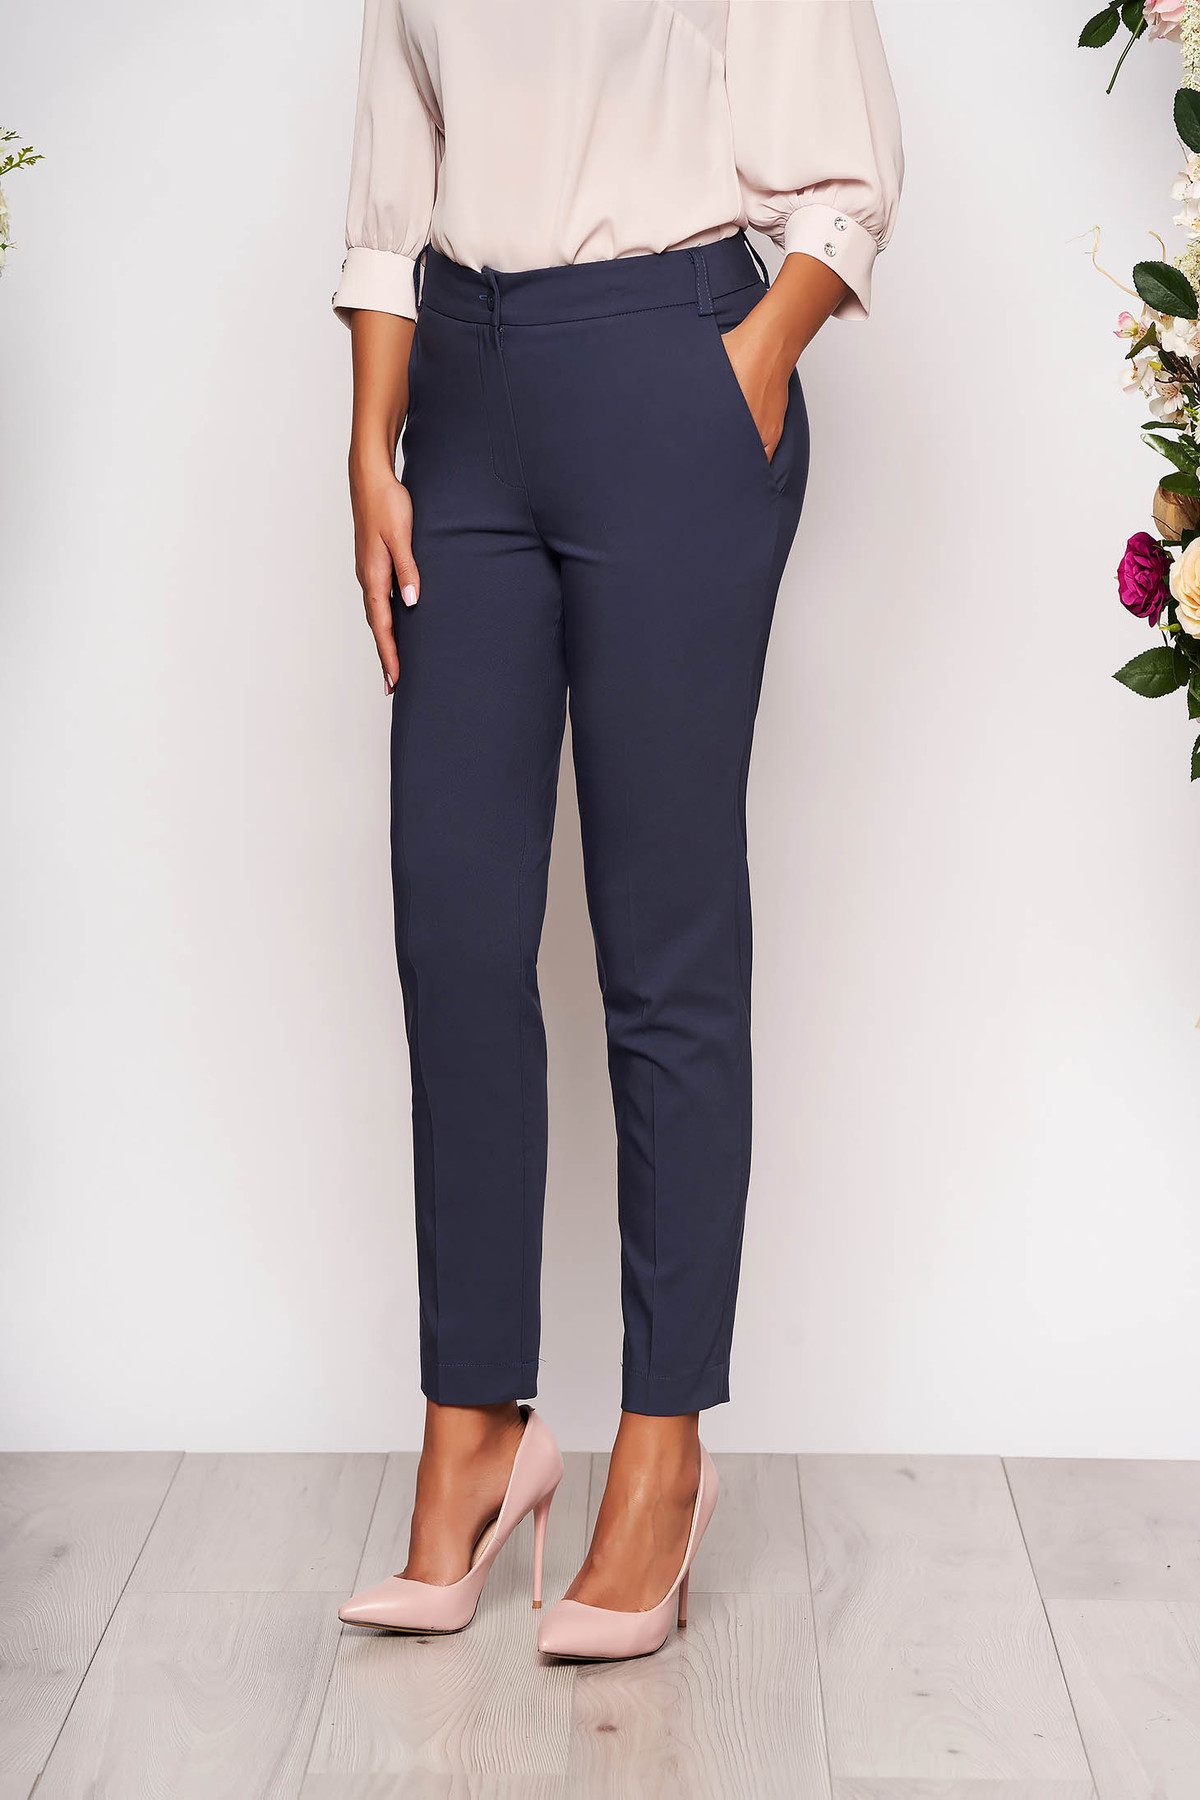 Pantaloni albastru-inchis lungi eleganti cu talie medie conici din stofa subtire cu buzunare